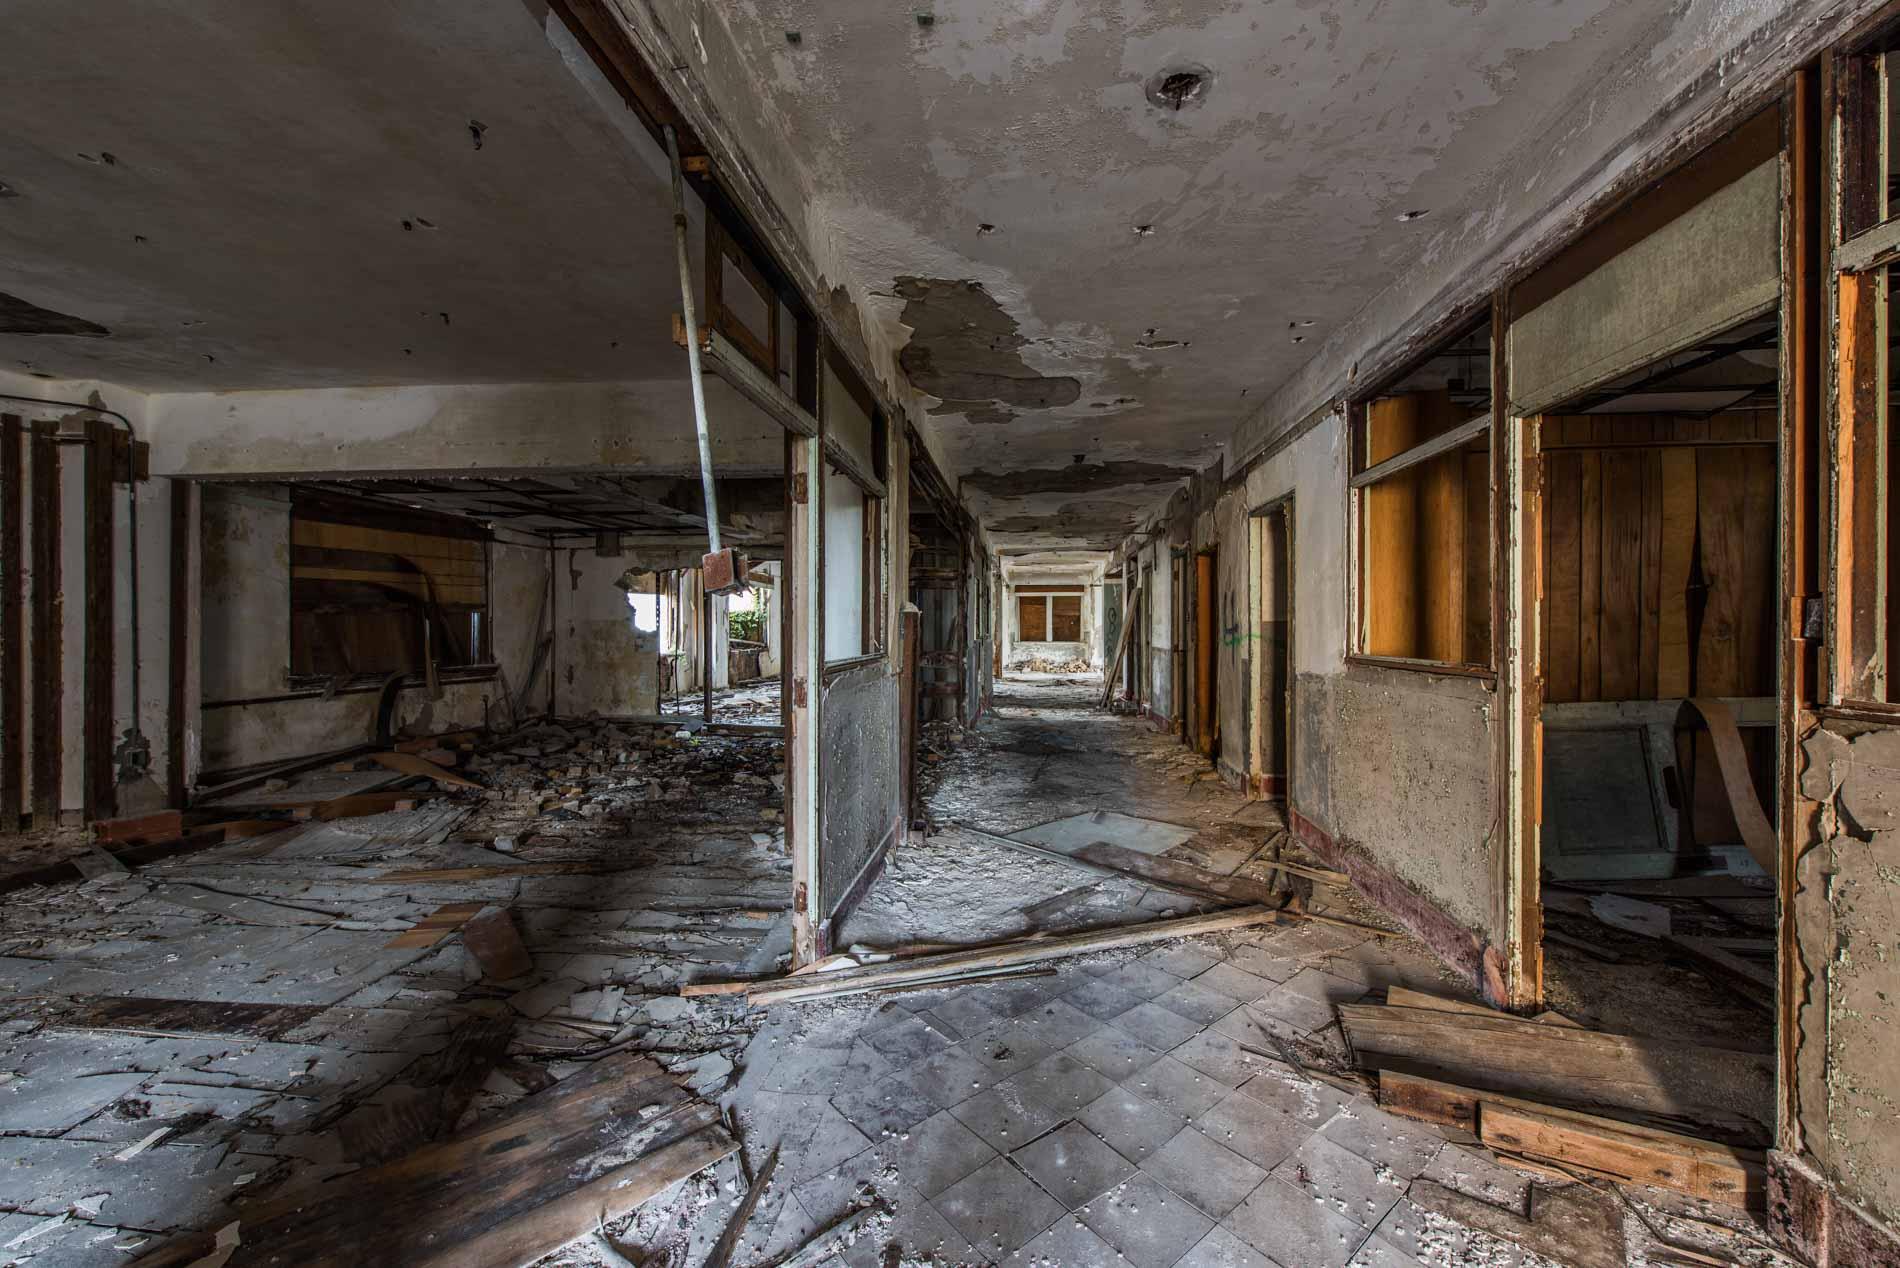 Florida Baptist Convention Building | Abandoned Florida